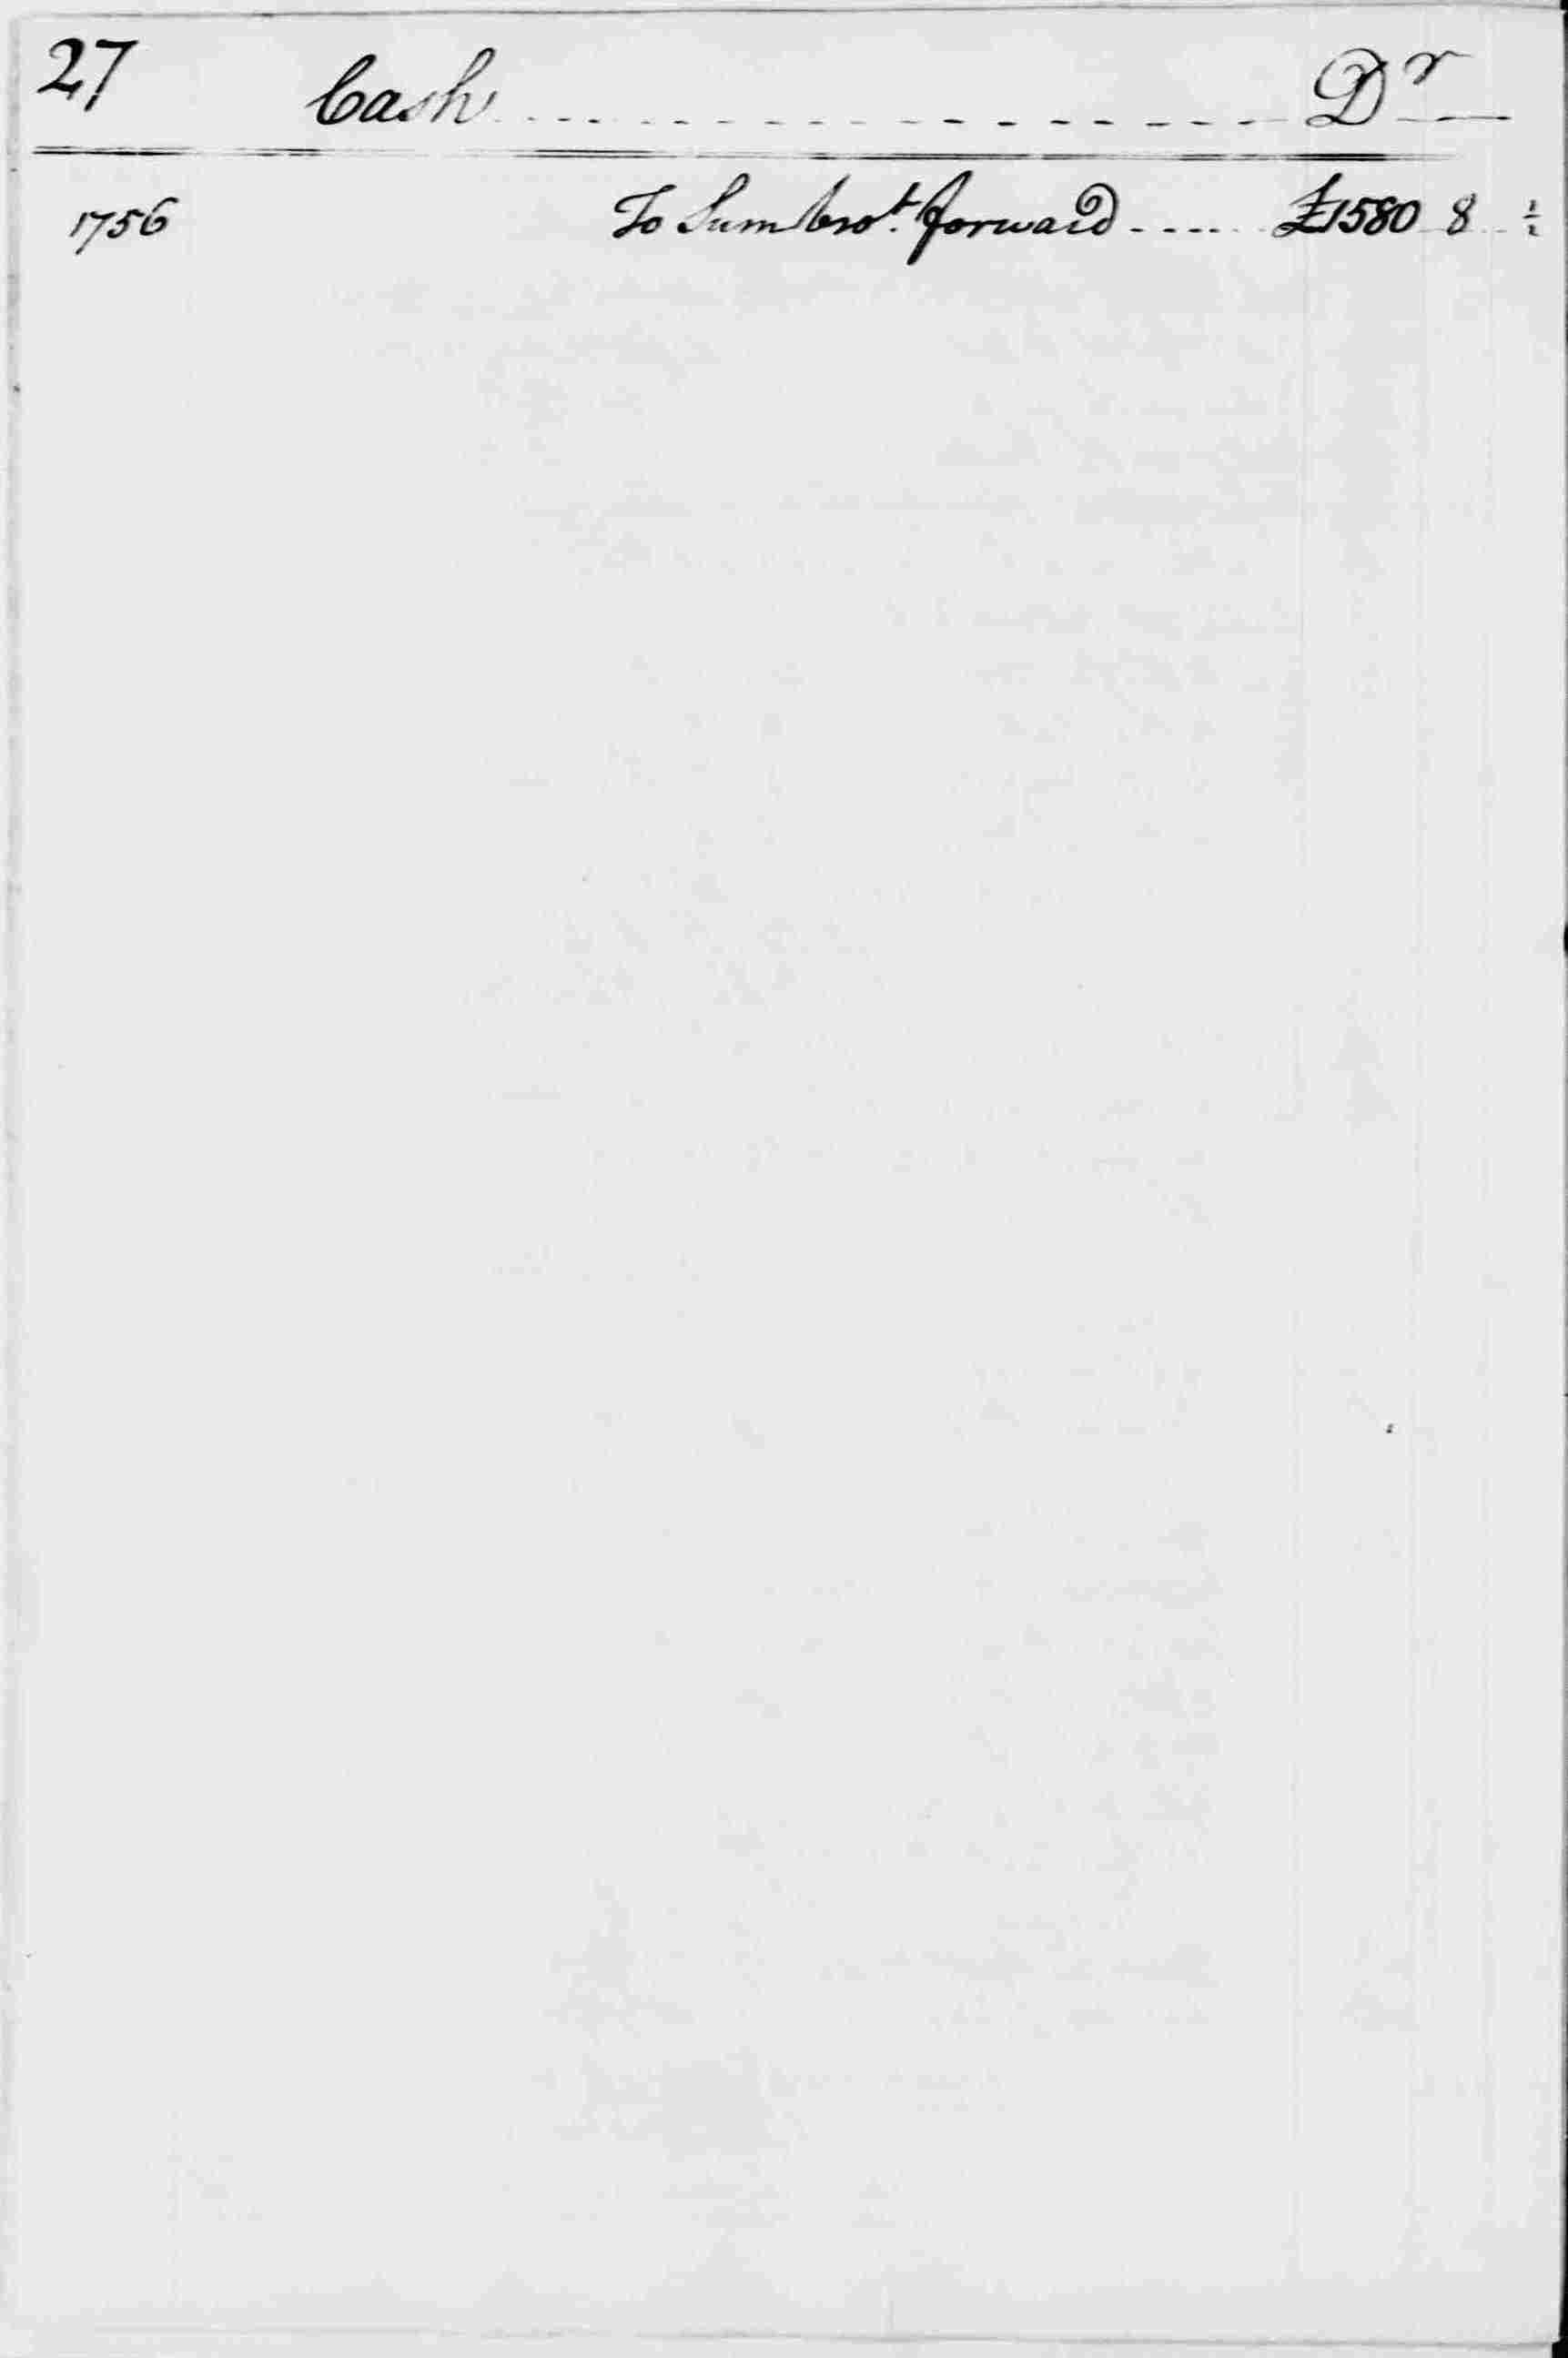 Ledger A, folio 27, left side